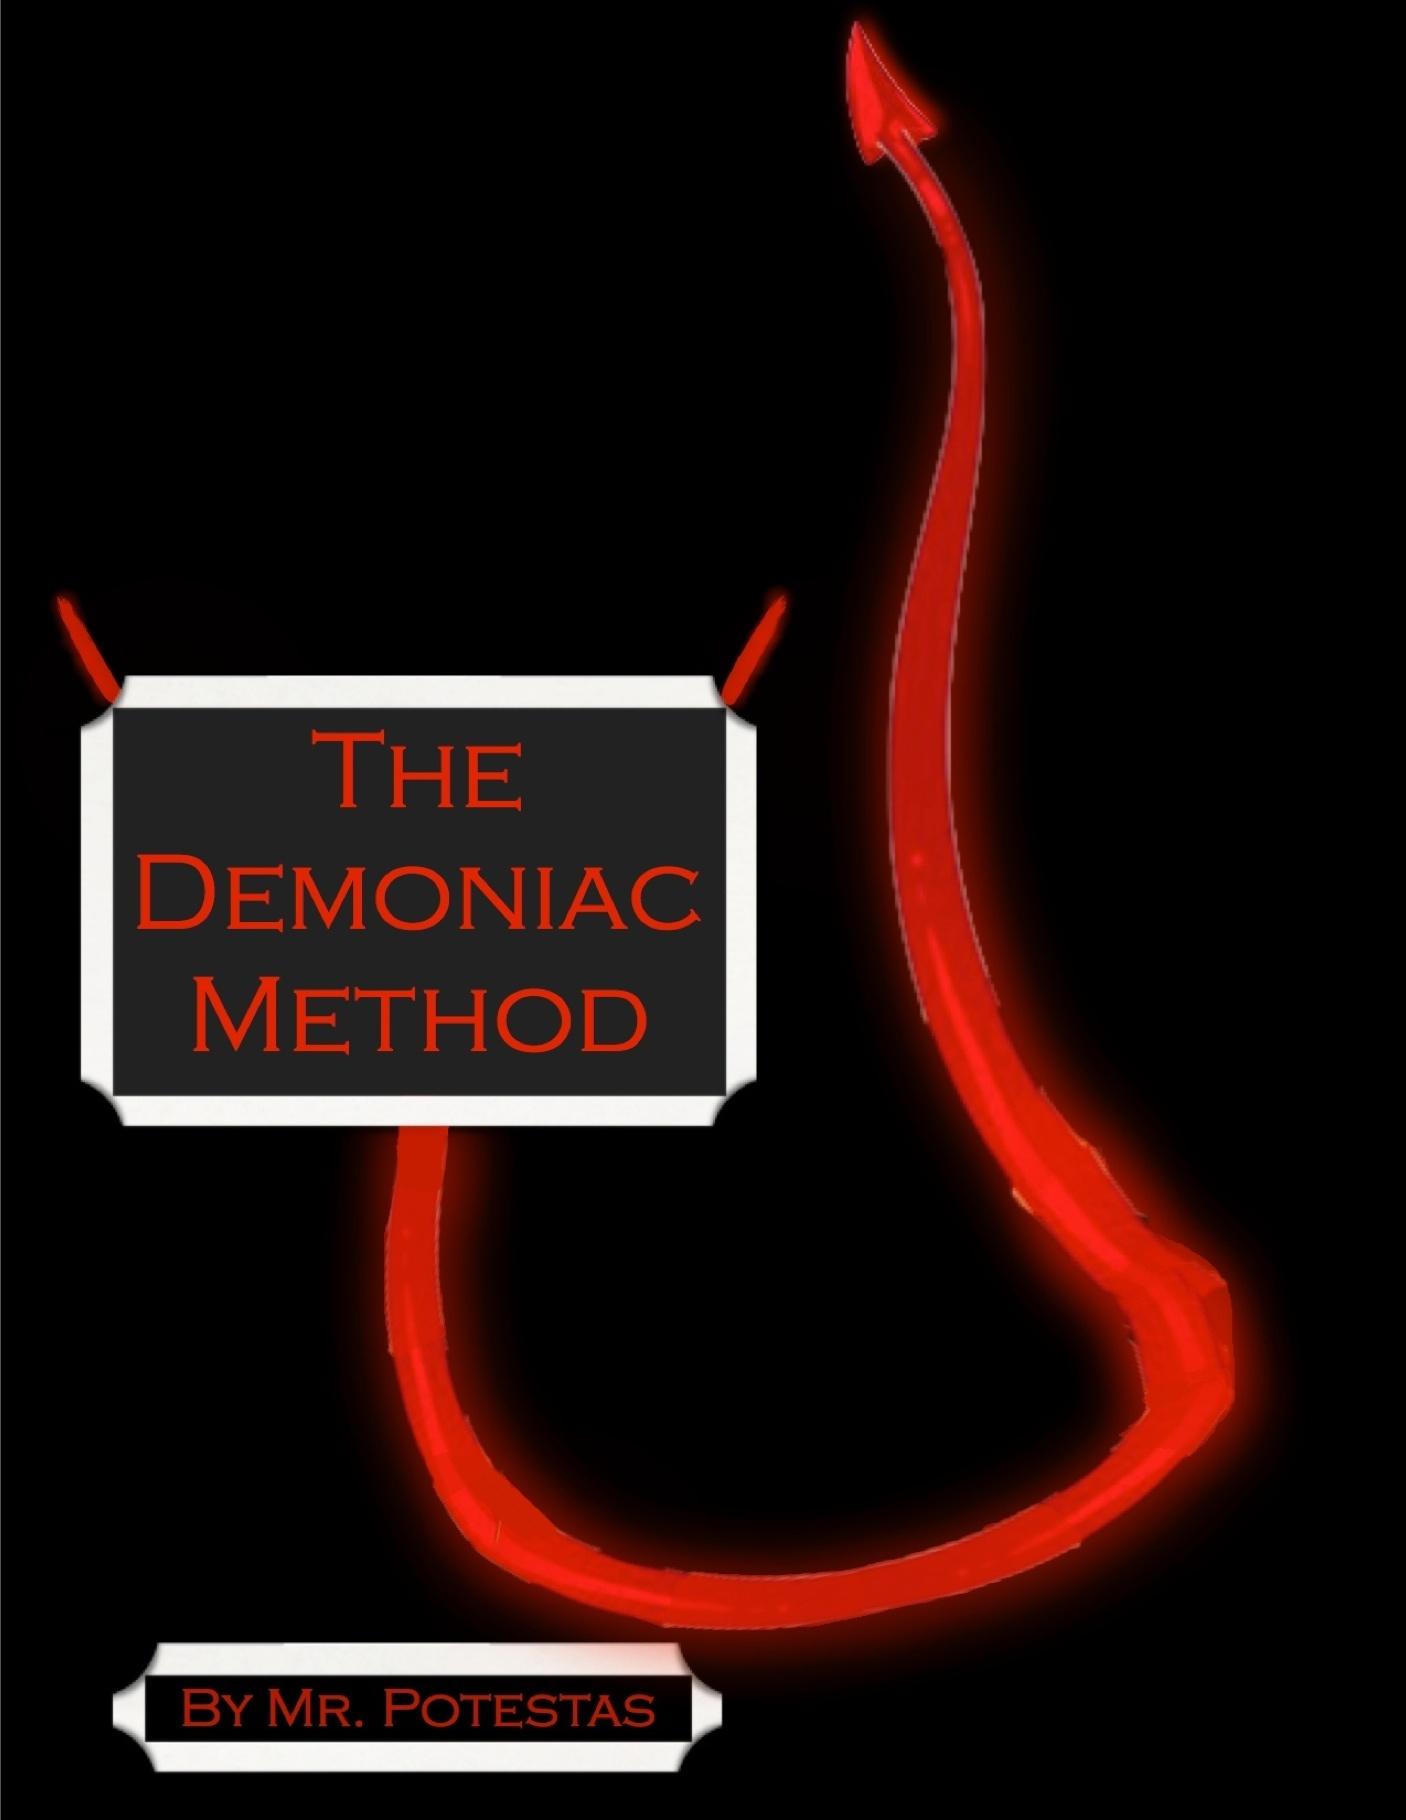 The Demoniac Method